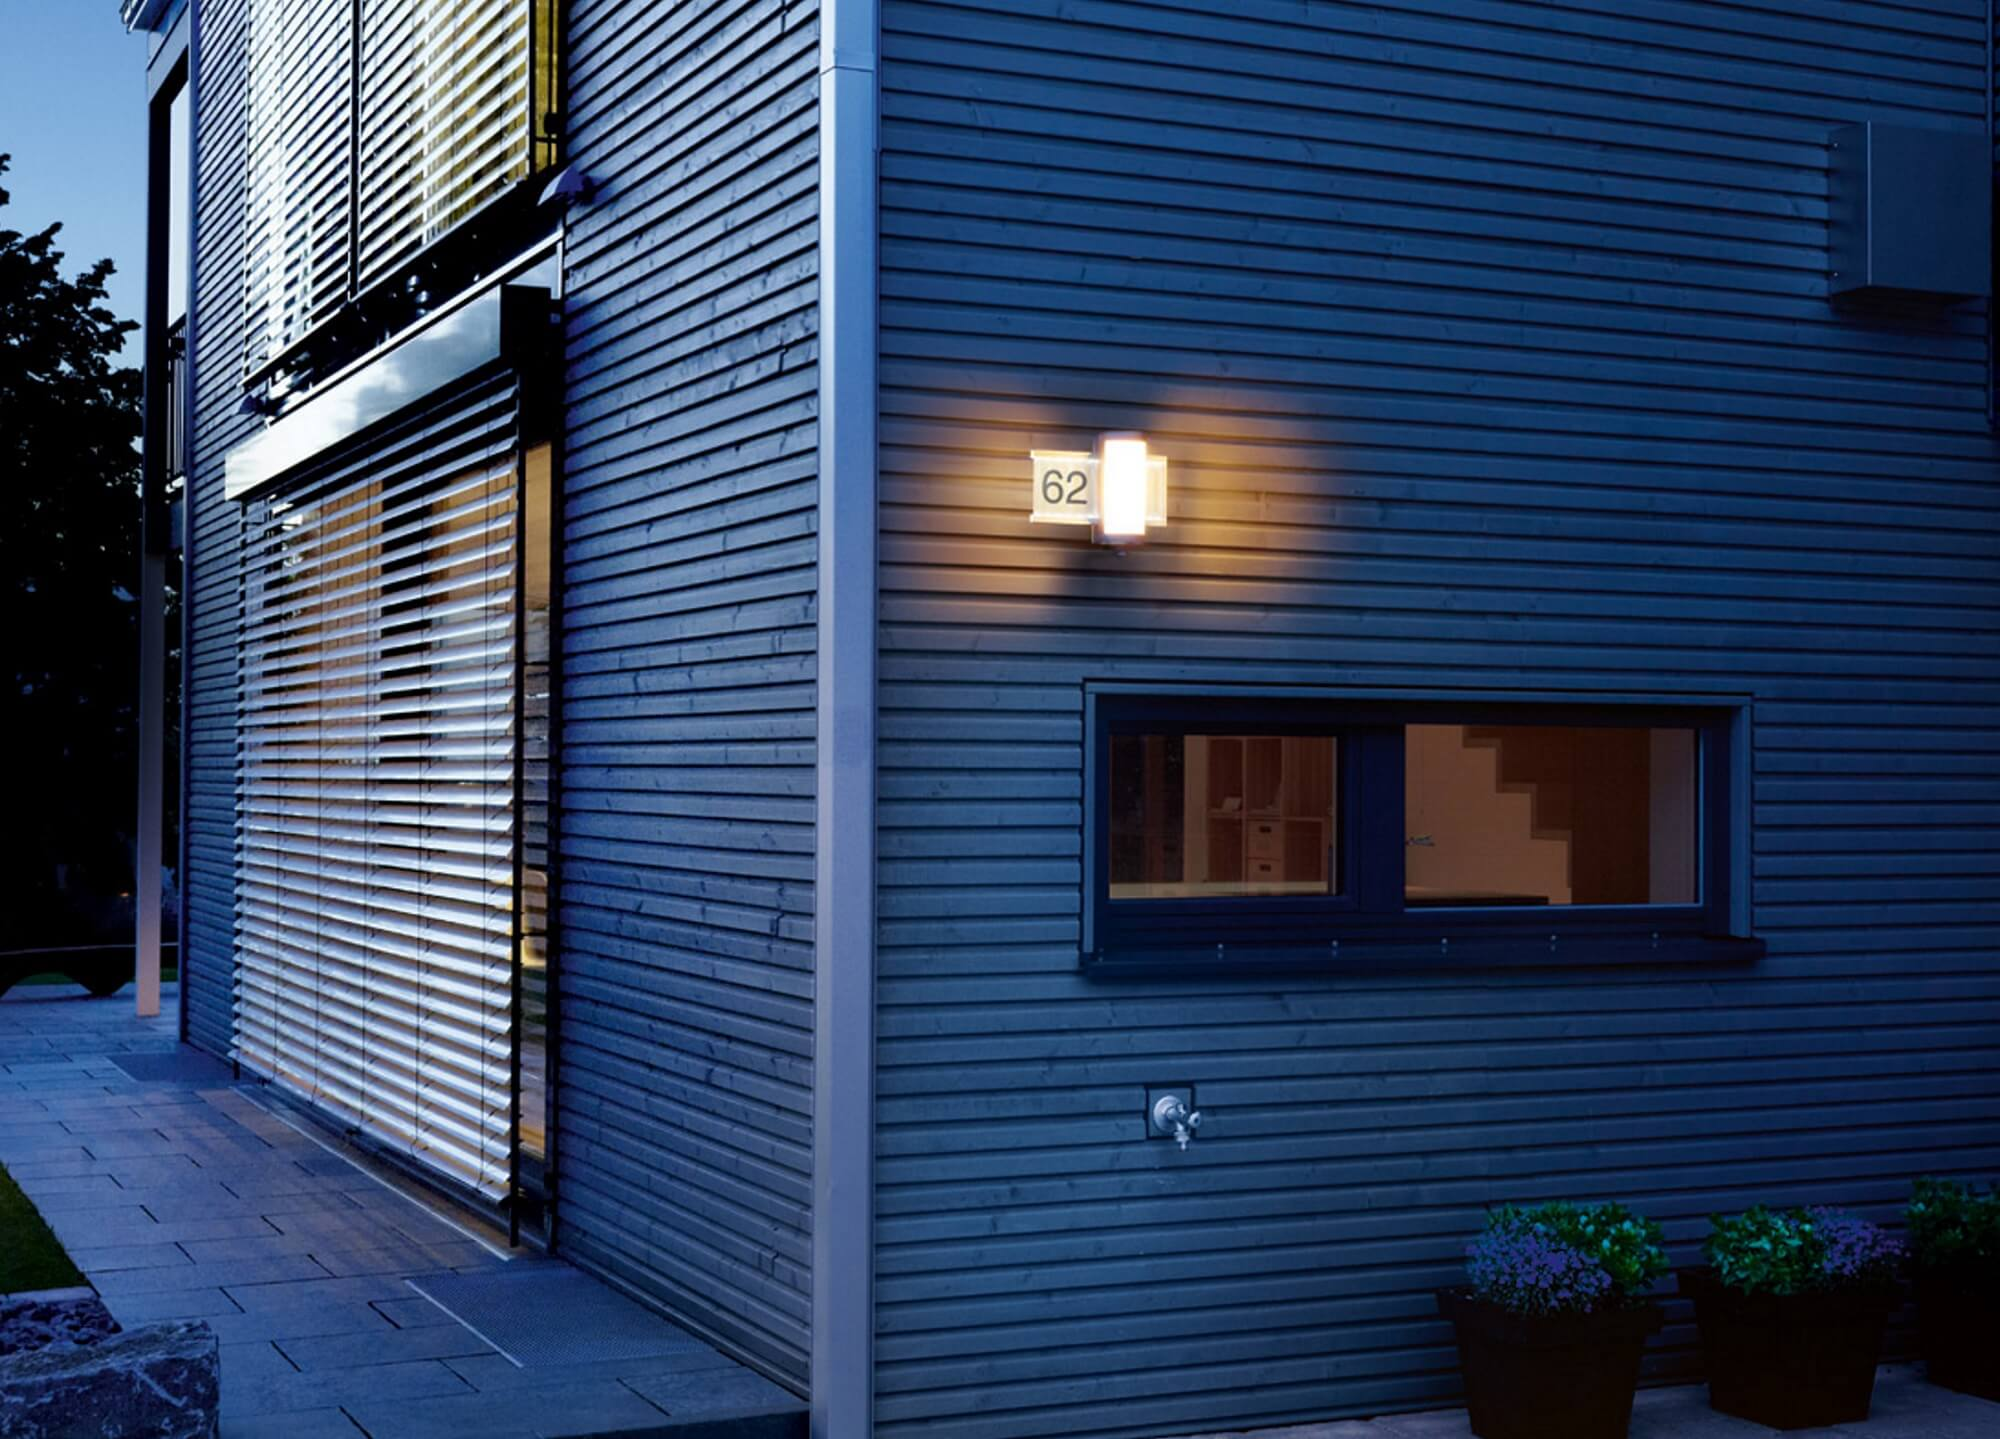 lampa LED nr domu